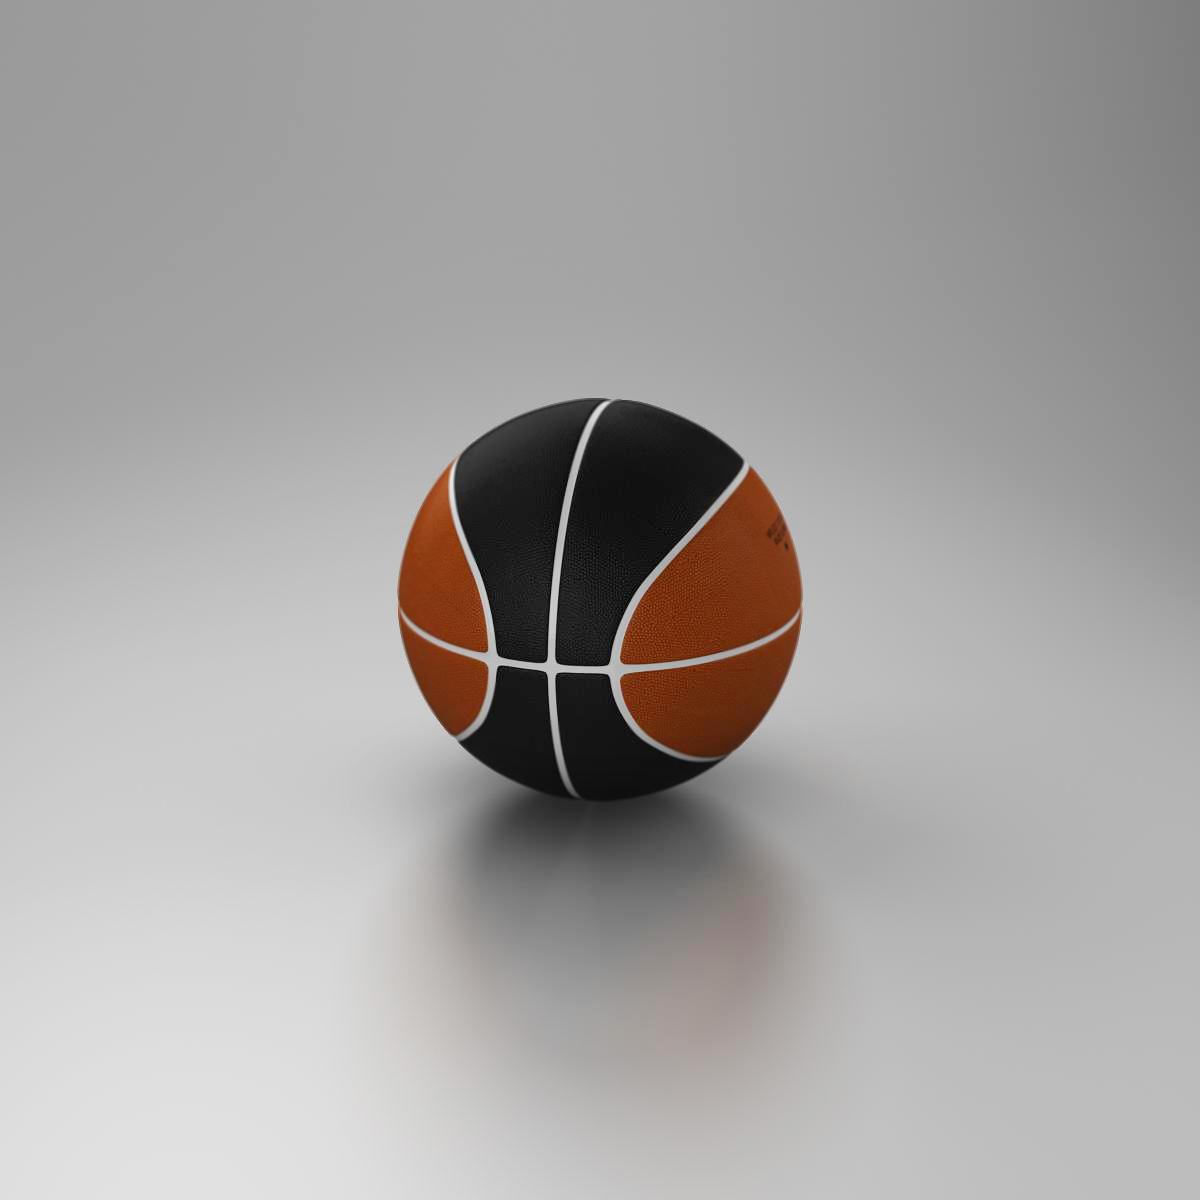 standard basketball ball 3d model 3ds max fbx c4d ma mb obj 164717